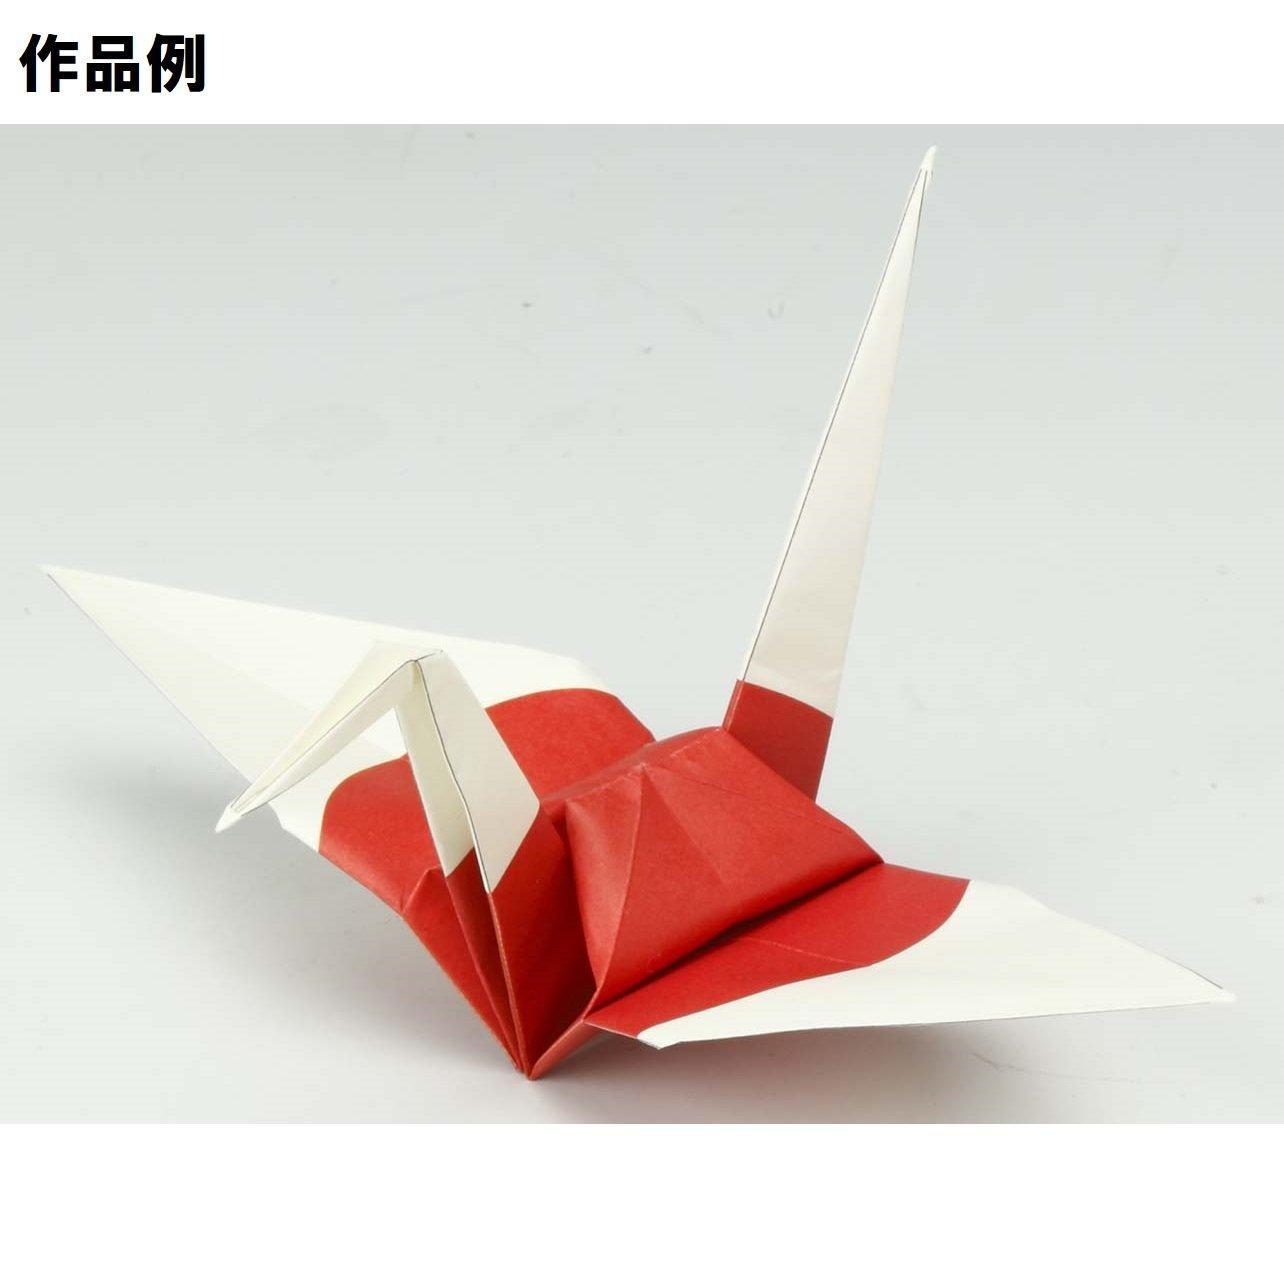 Amazon toyo origami for crane with national flag printed amazon toyo origami for crane with national flag printed 15cm x 15cm 24 patterns 2 sheets each 006120 office products jeuxipadfo Images